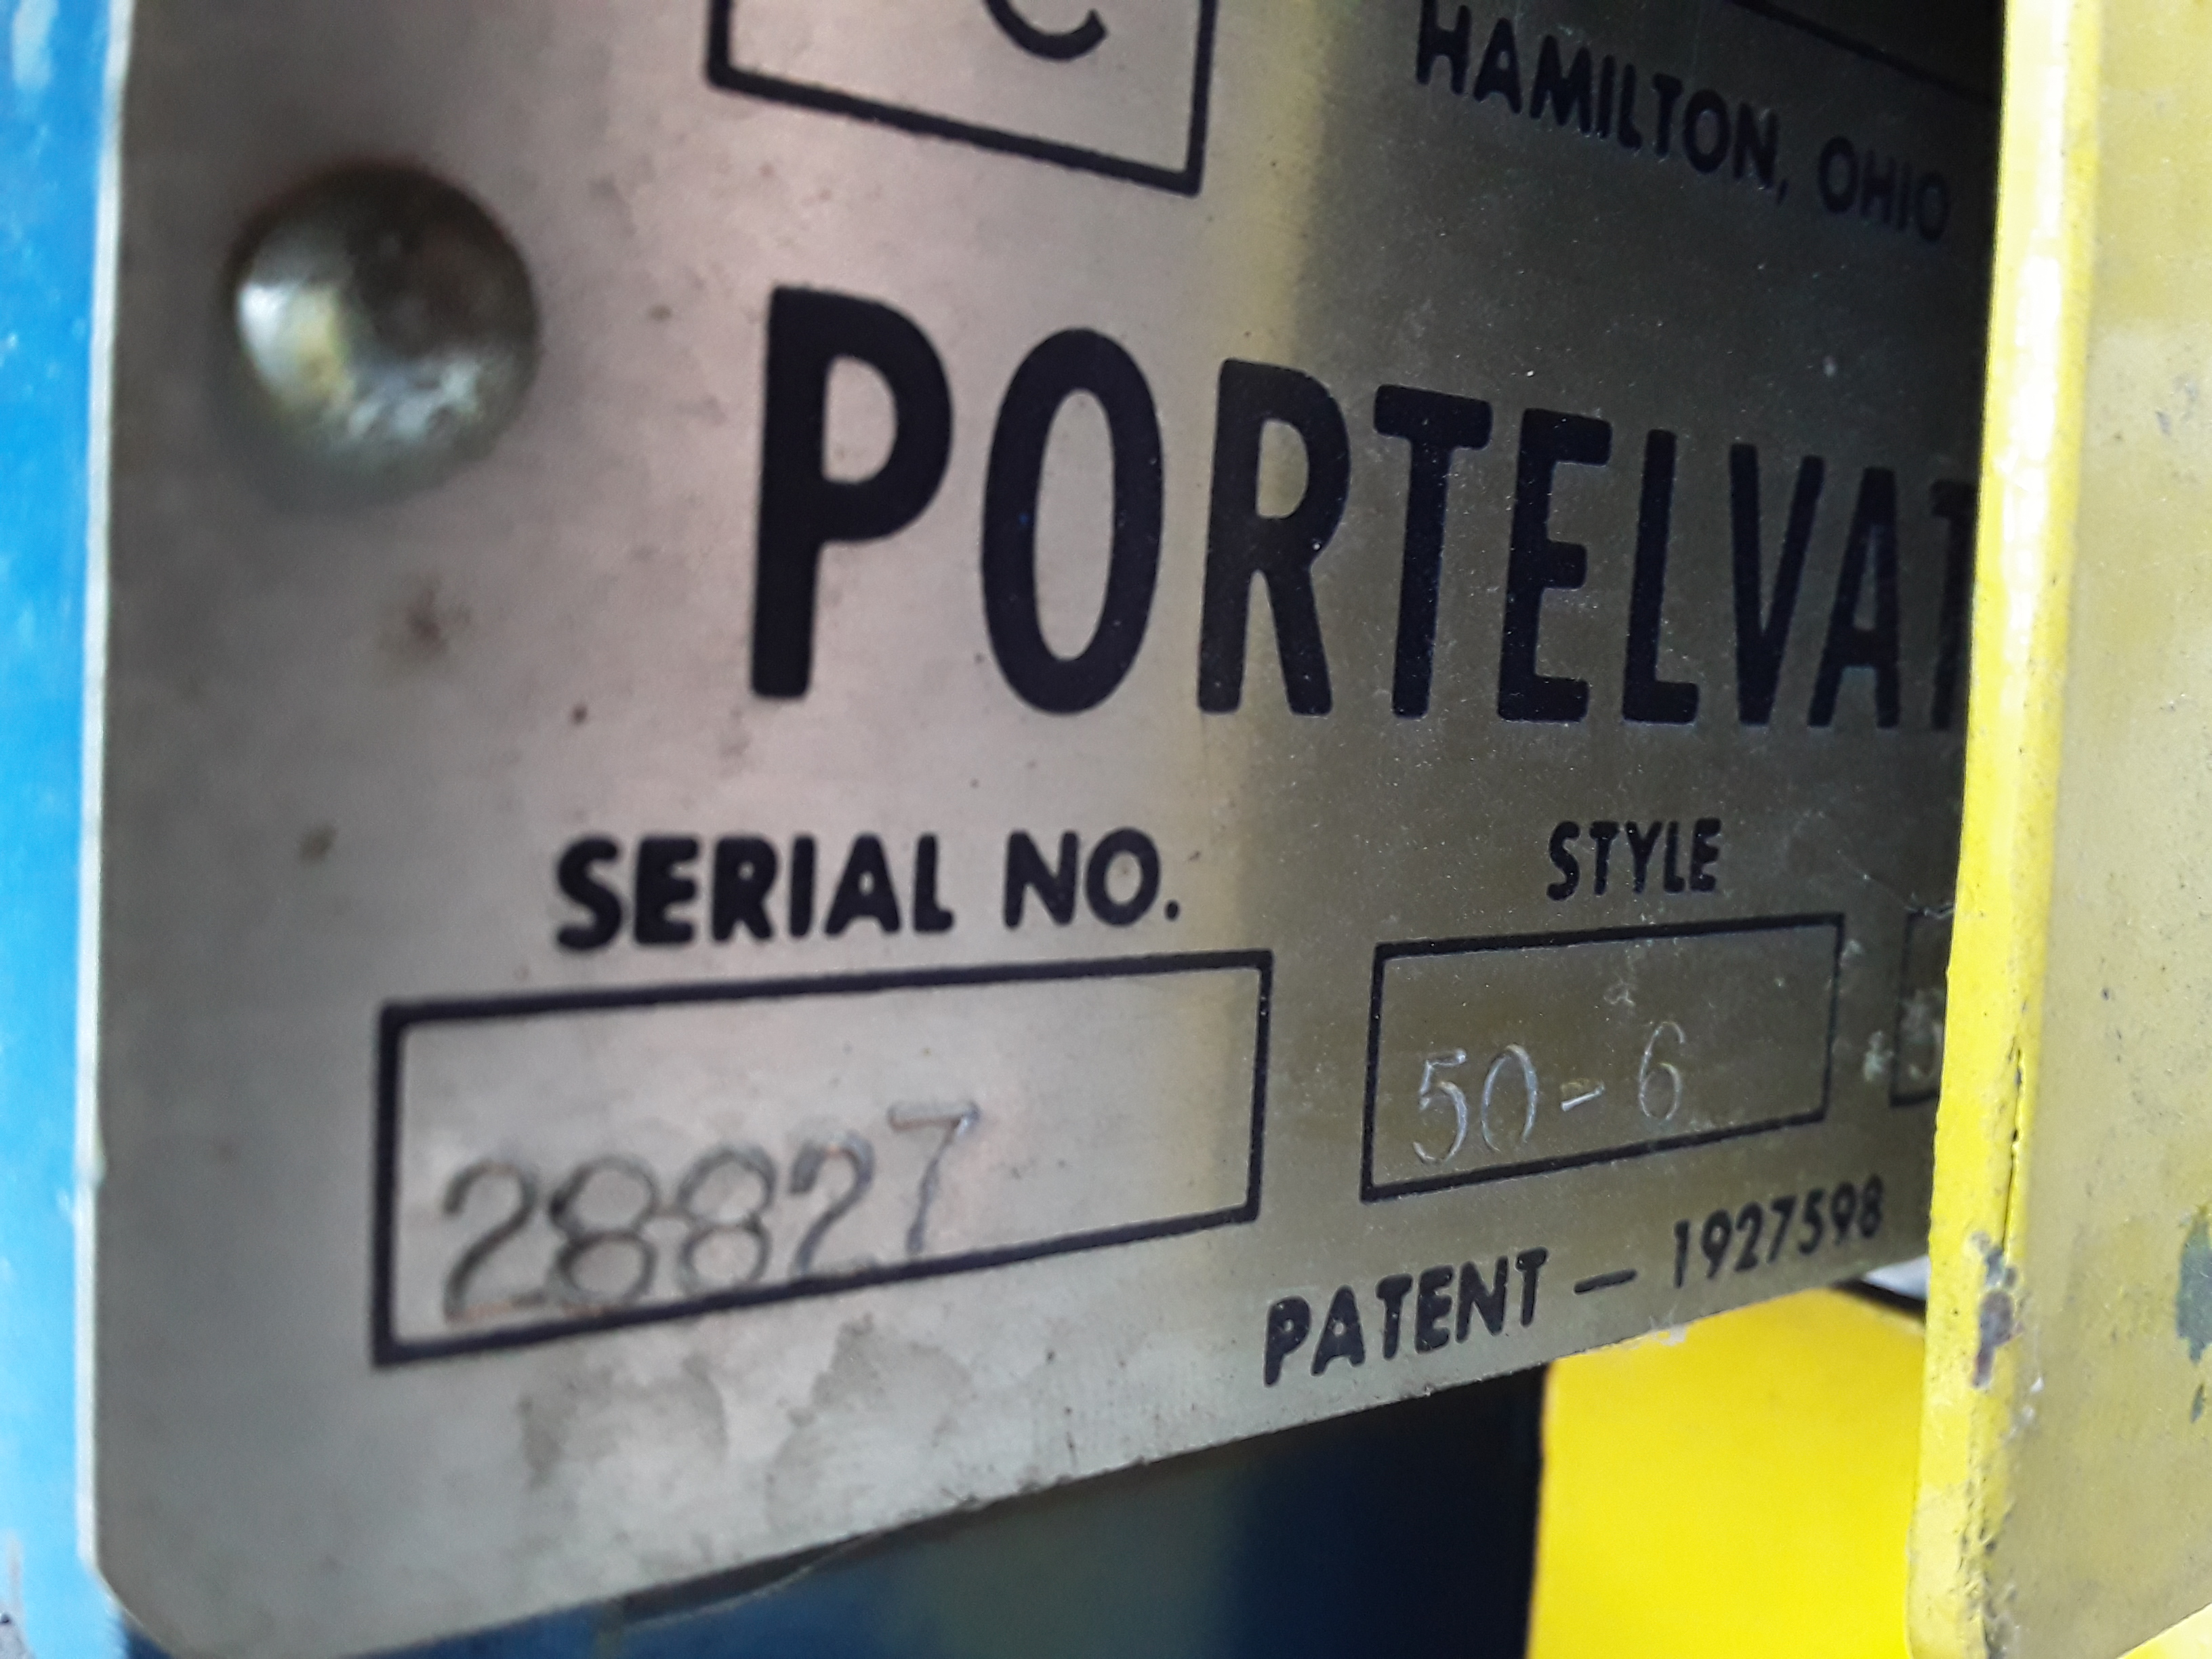 (1) PREOWNED PORTELEVATOR PORTABLE PRESS DIE HOIST TABLE, <br>MODEL 50-6, S/N 28827